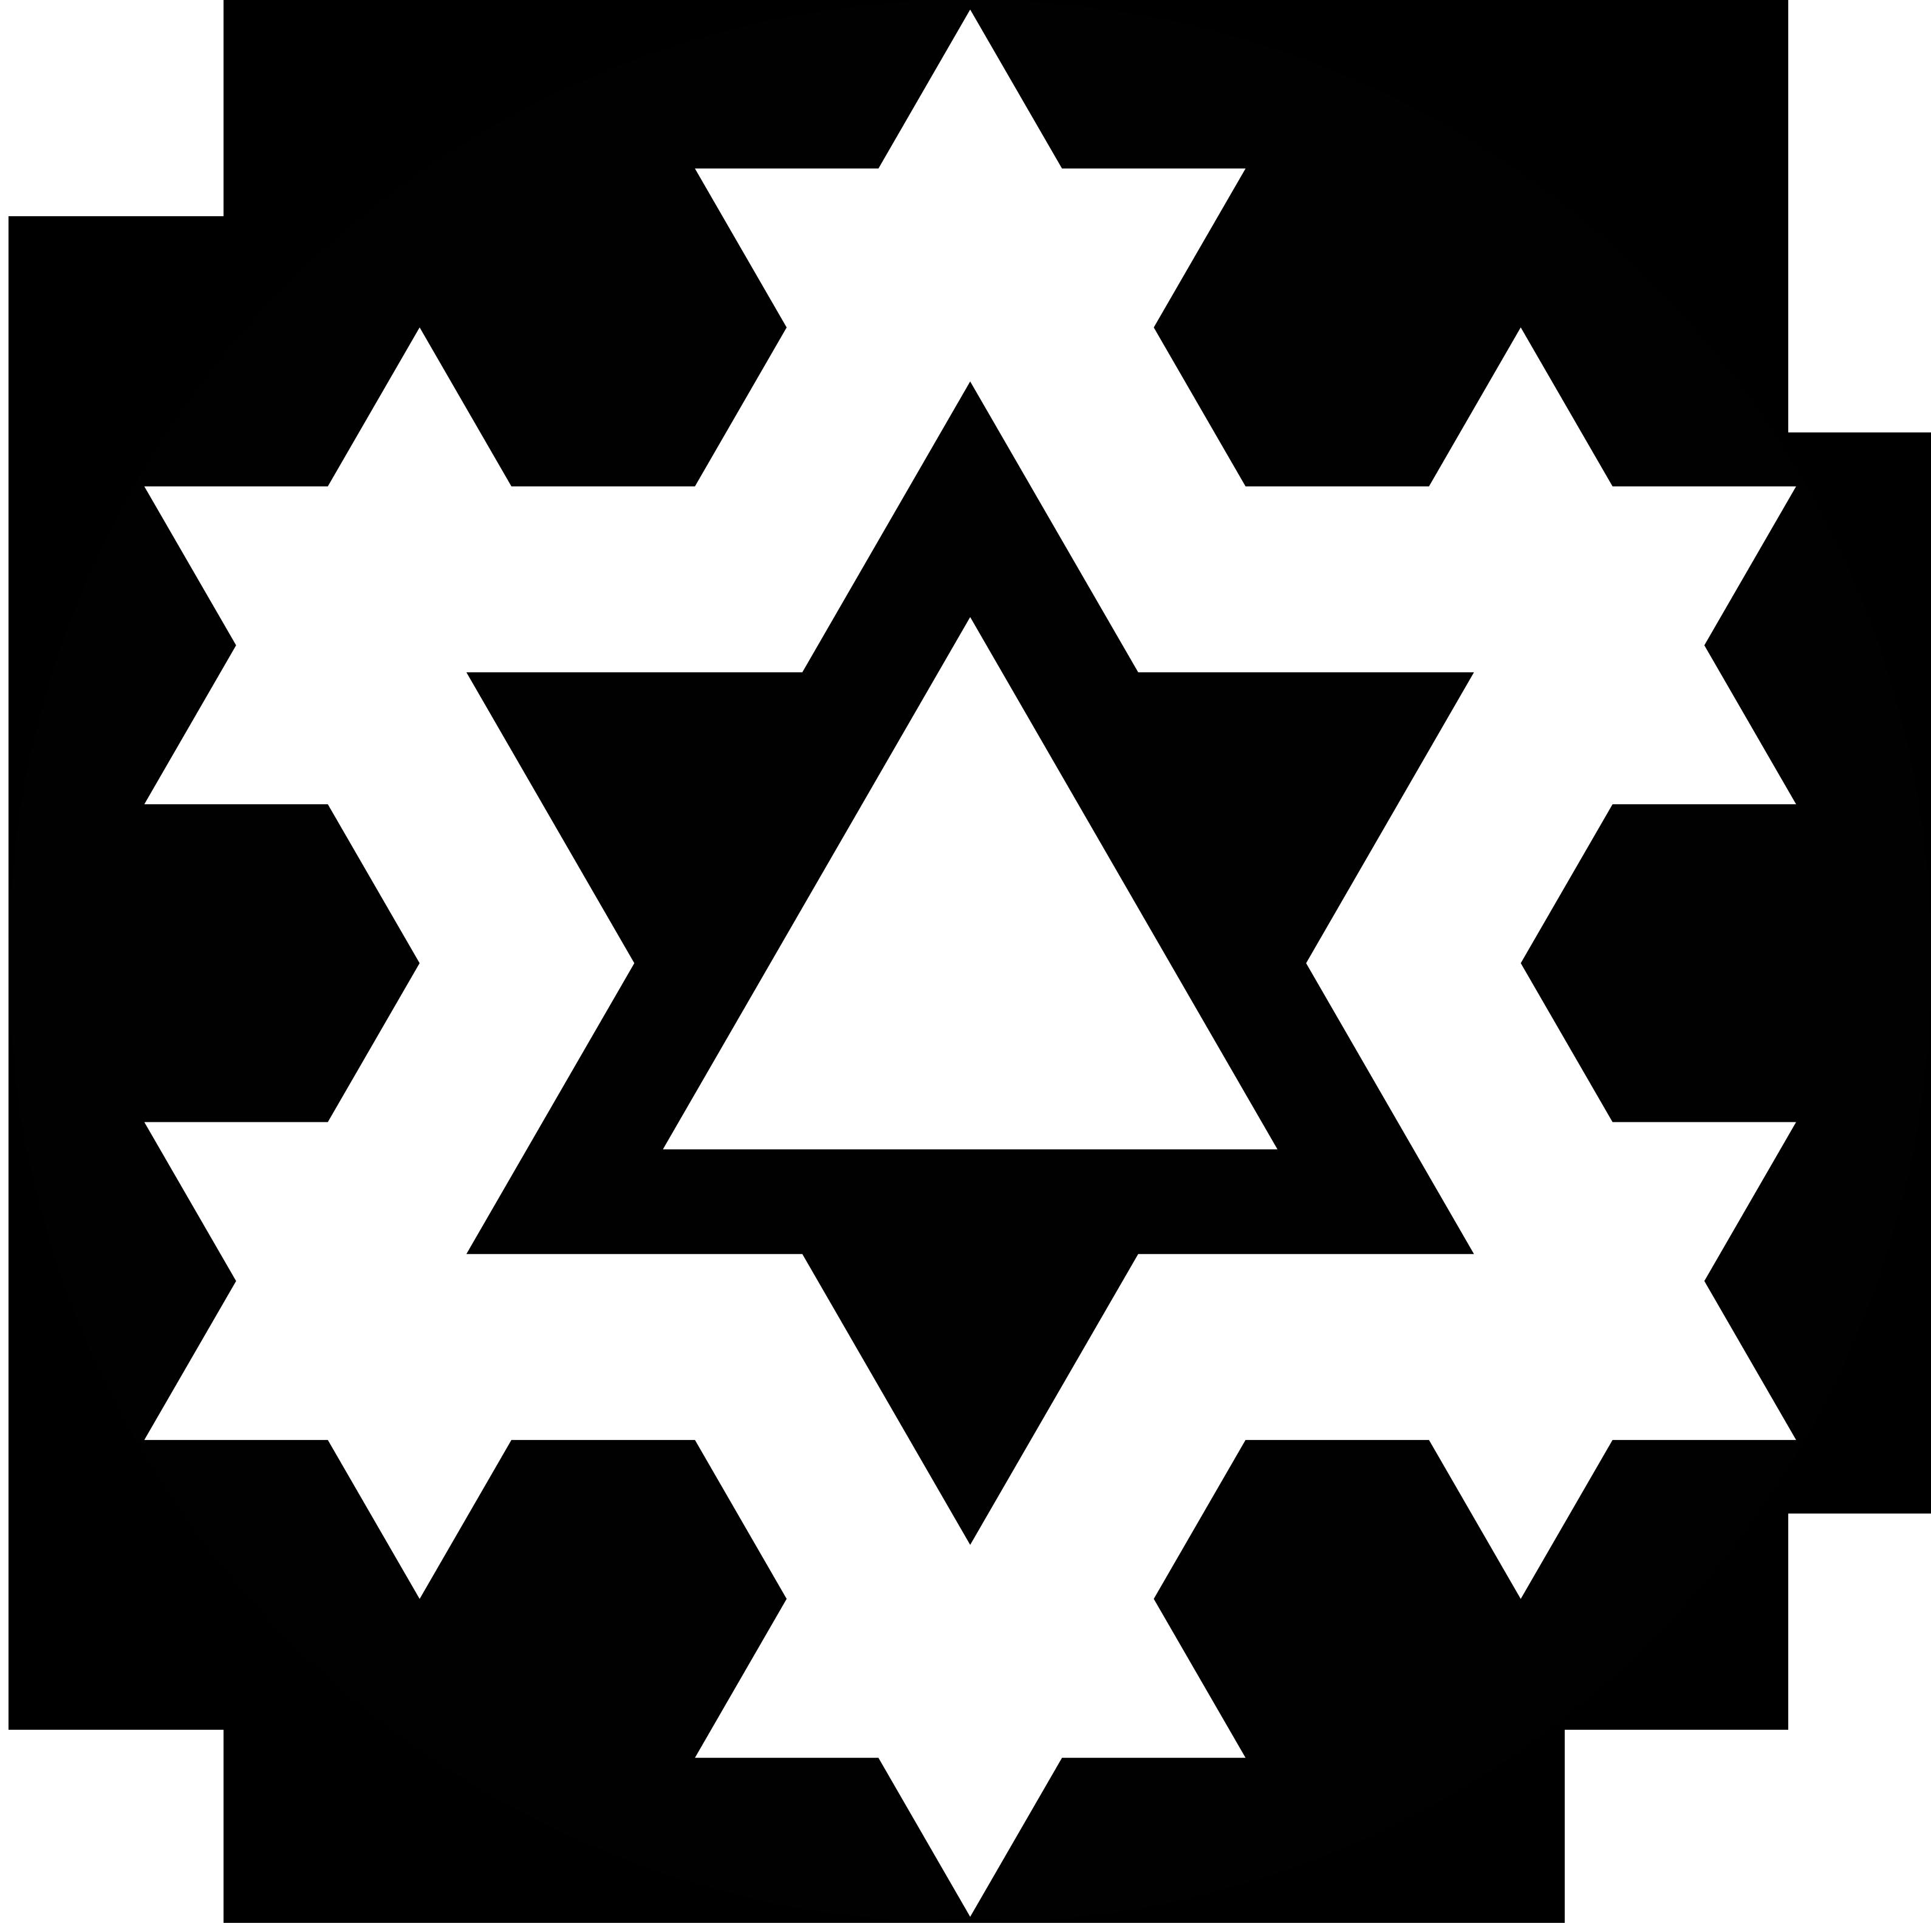 MUR (Mathematics)